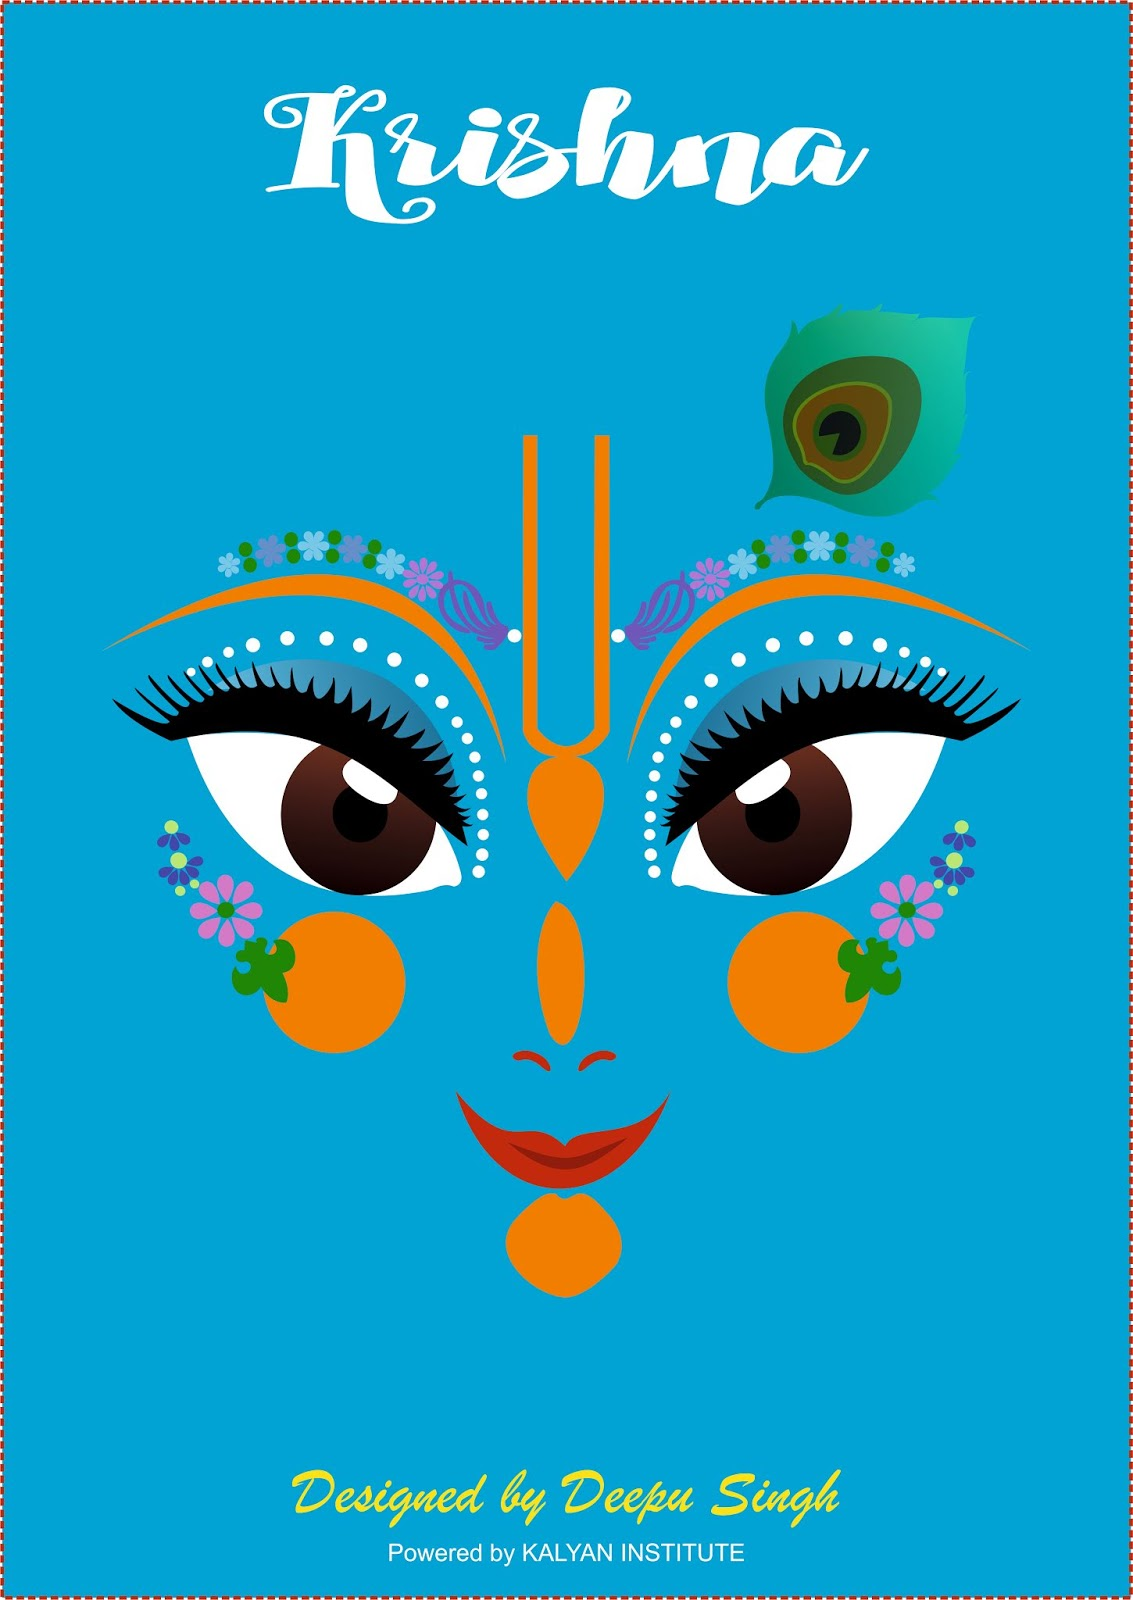 Krishna Art Design    Create in CorelDRAW X7   Dk Graphic Creative